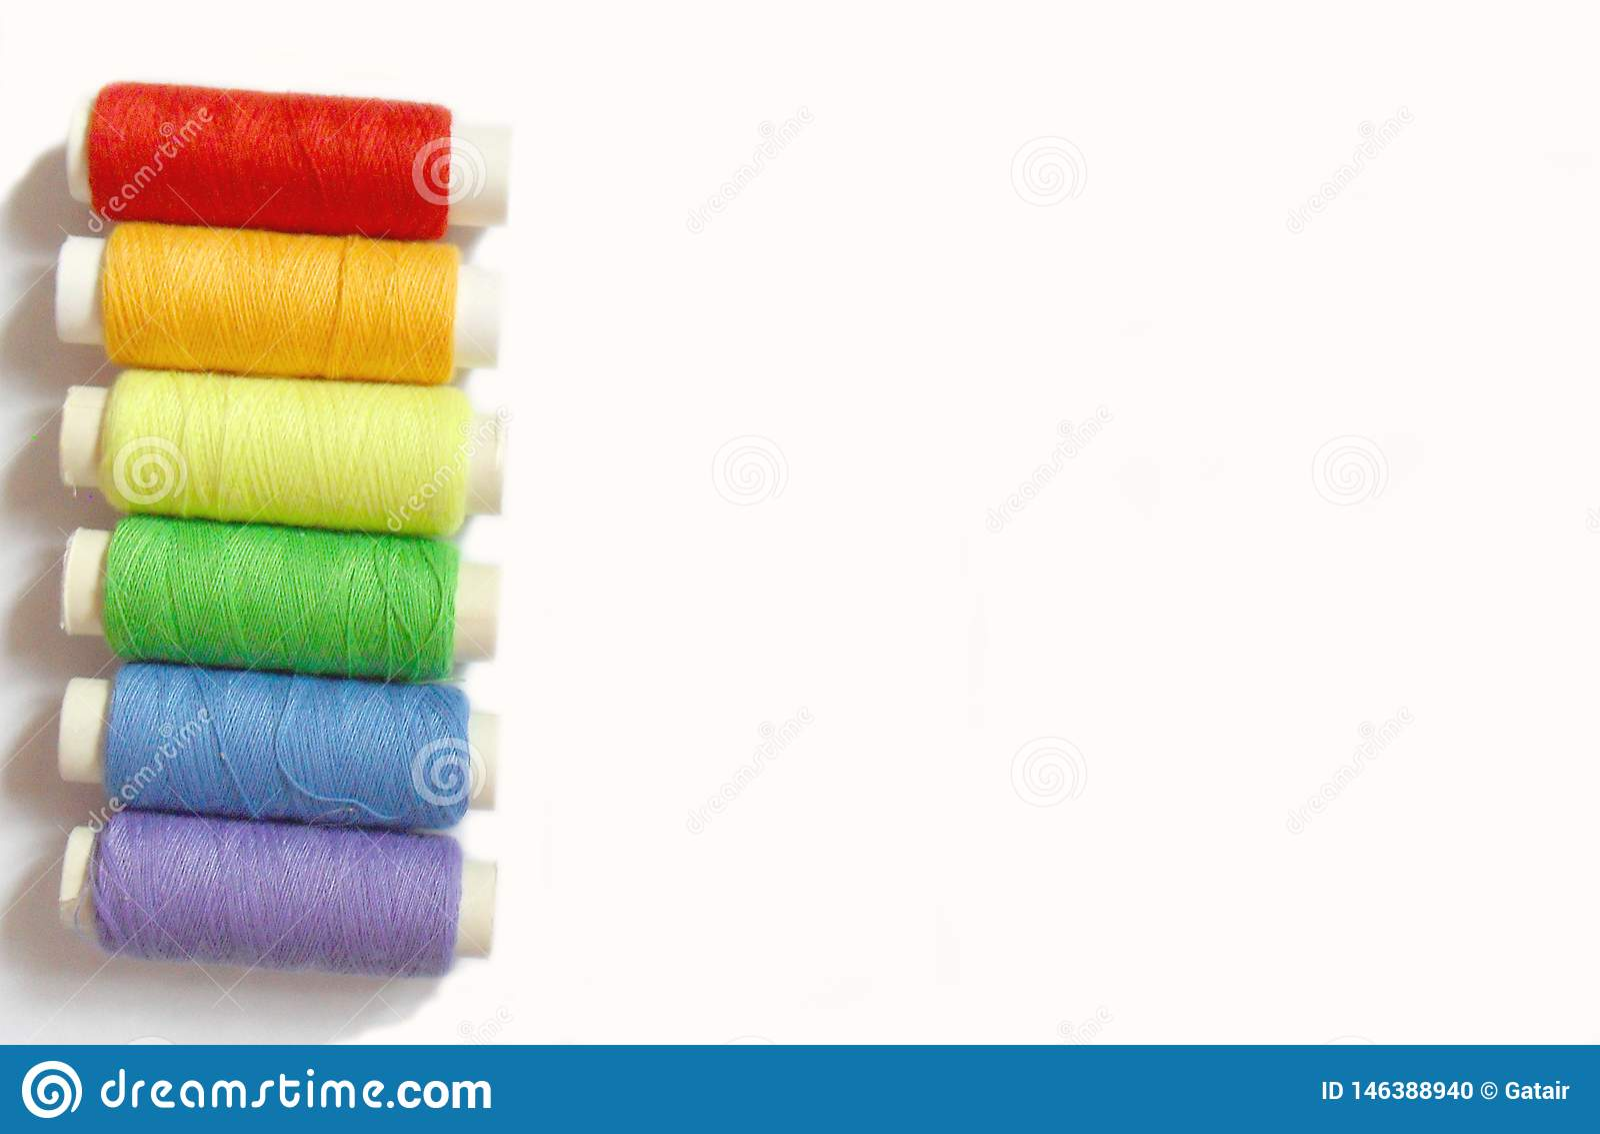 Bobinas coloridas isoladas no fundo branco, cores do arco-?ris